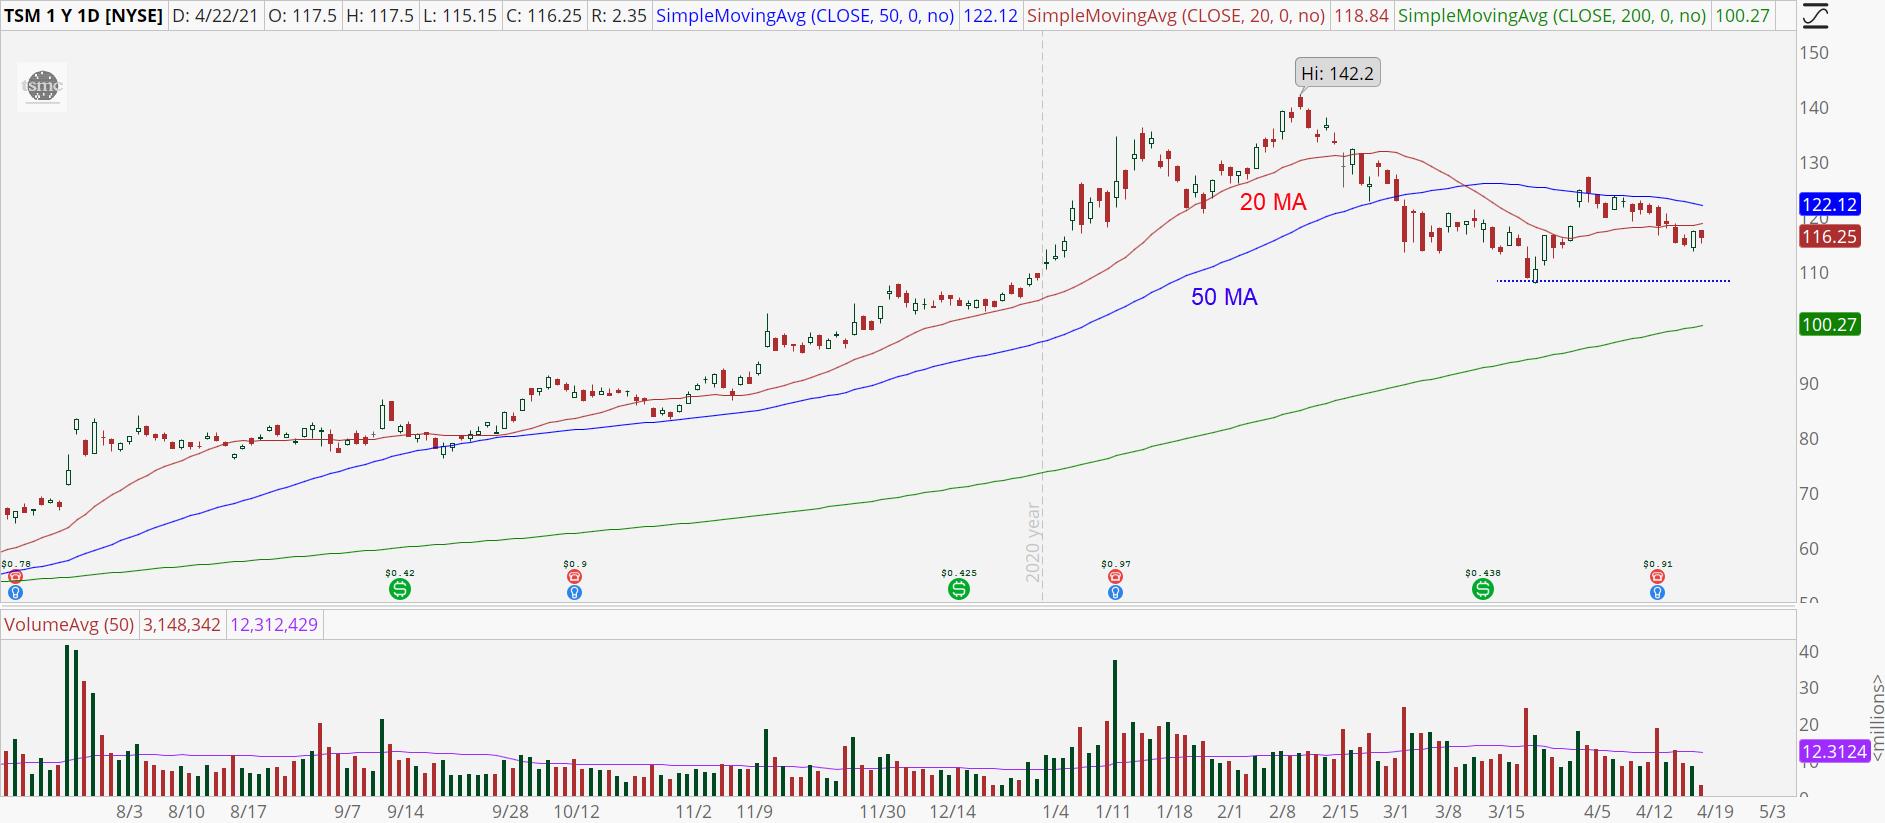 Taiwan Semiconductor (TSM) stock chart with trading range